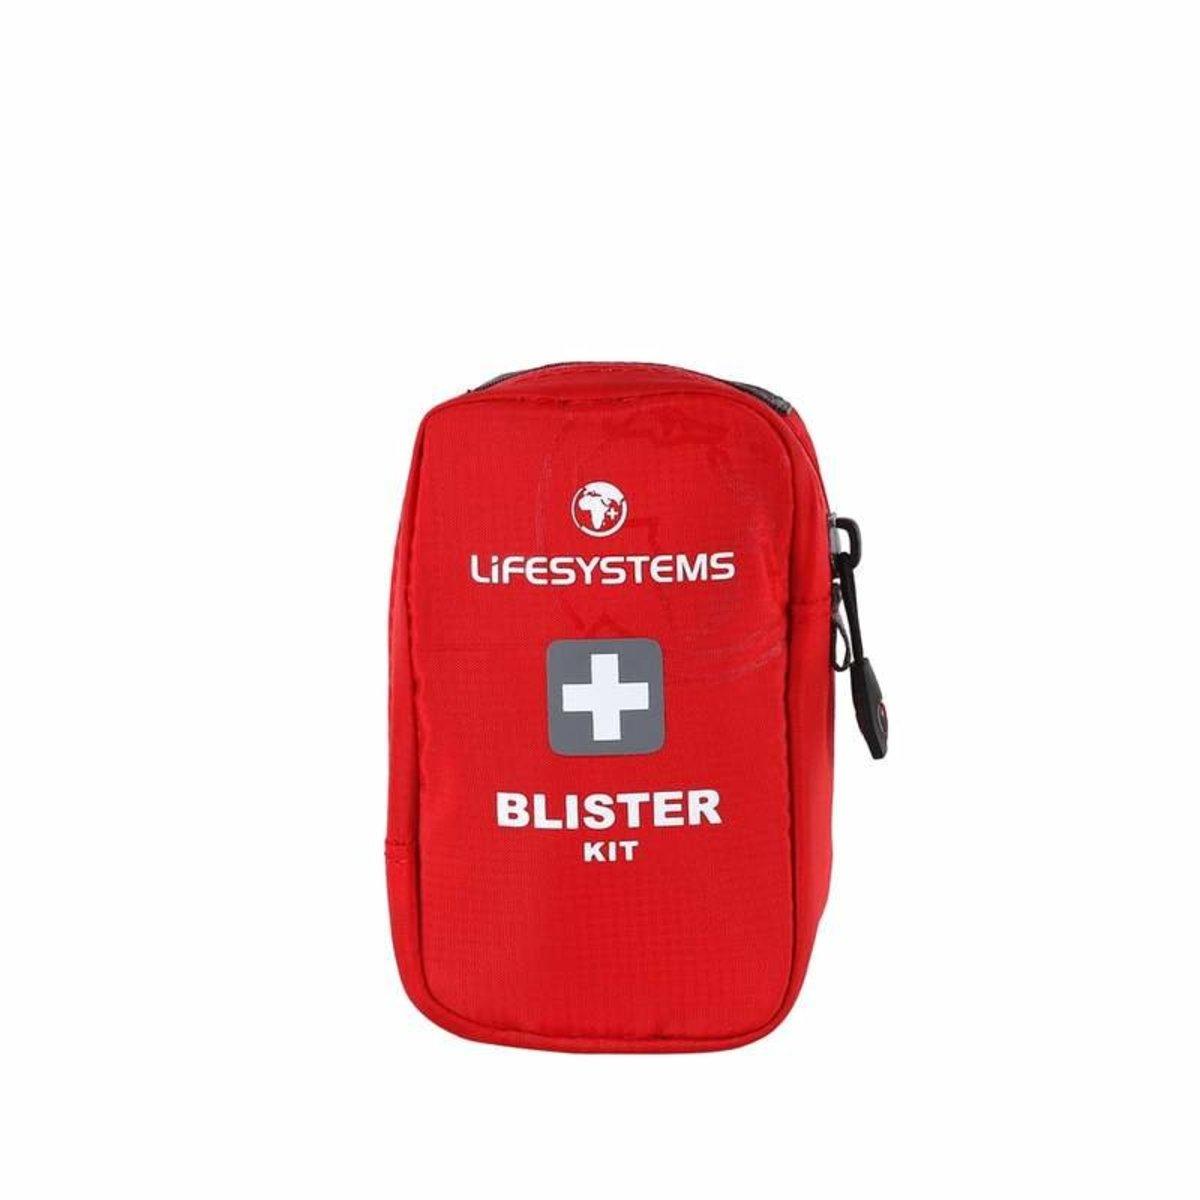 英國品牌水泡急救包 BLISTER FIRST AID KIT